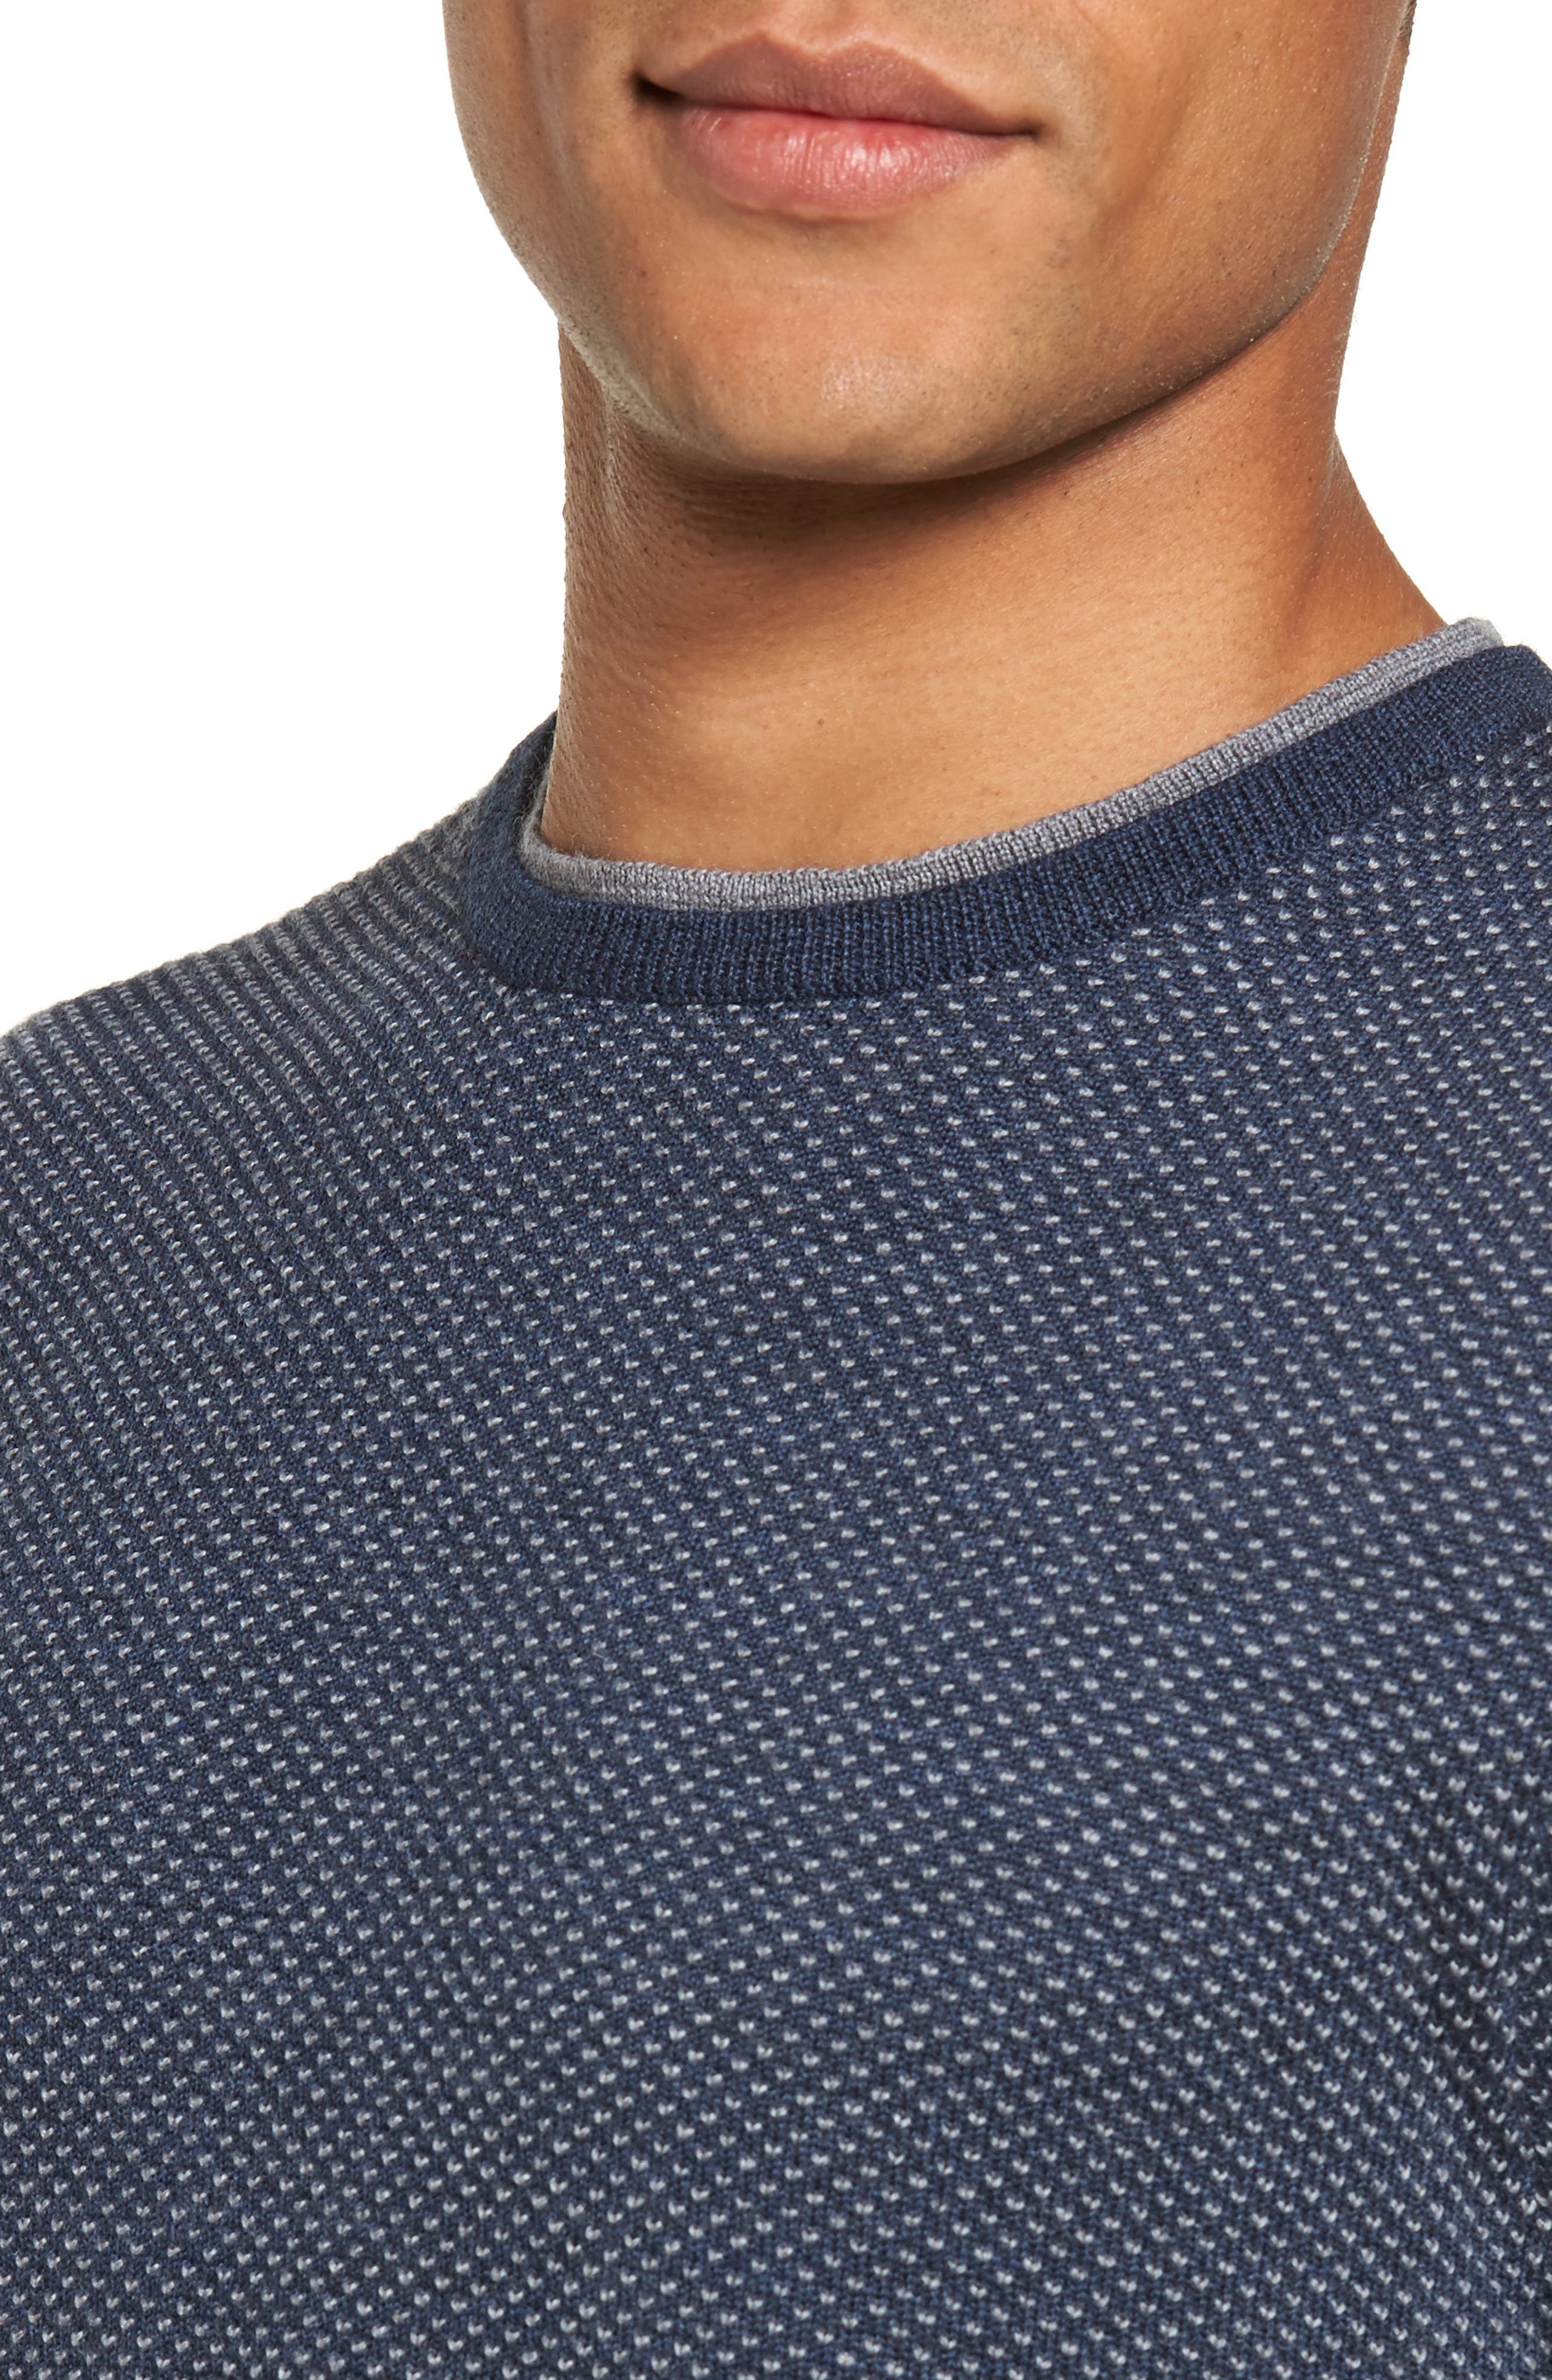 Crewneck Knit Sweater,                             Alternate thumbnail 4, color,